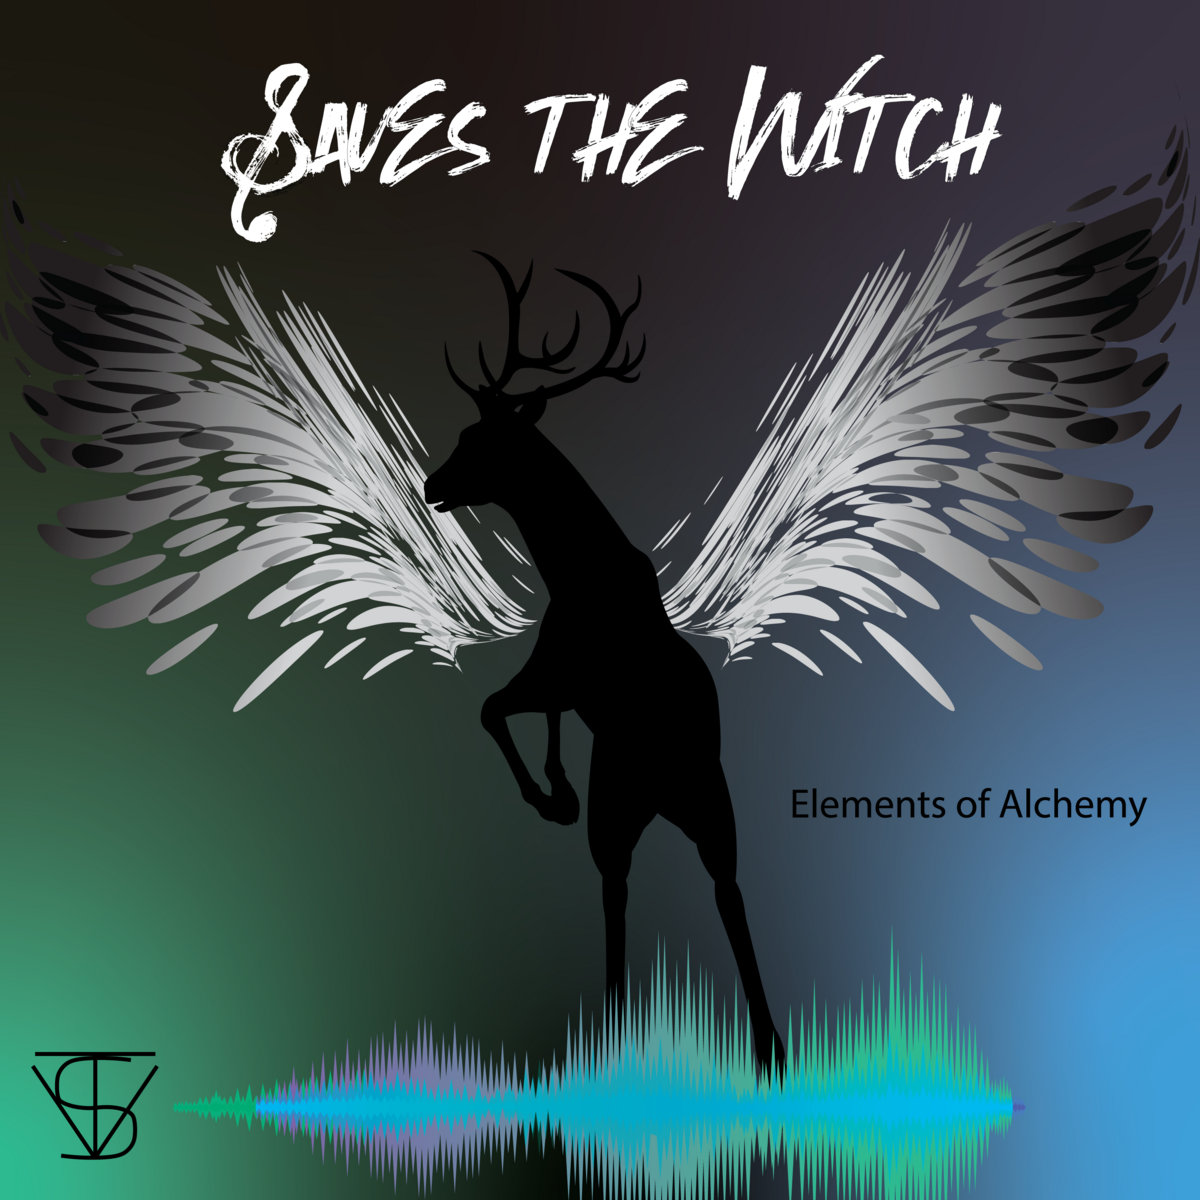 www.facebook.com/savesthewitch